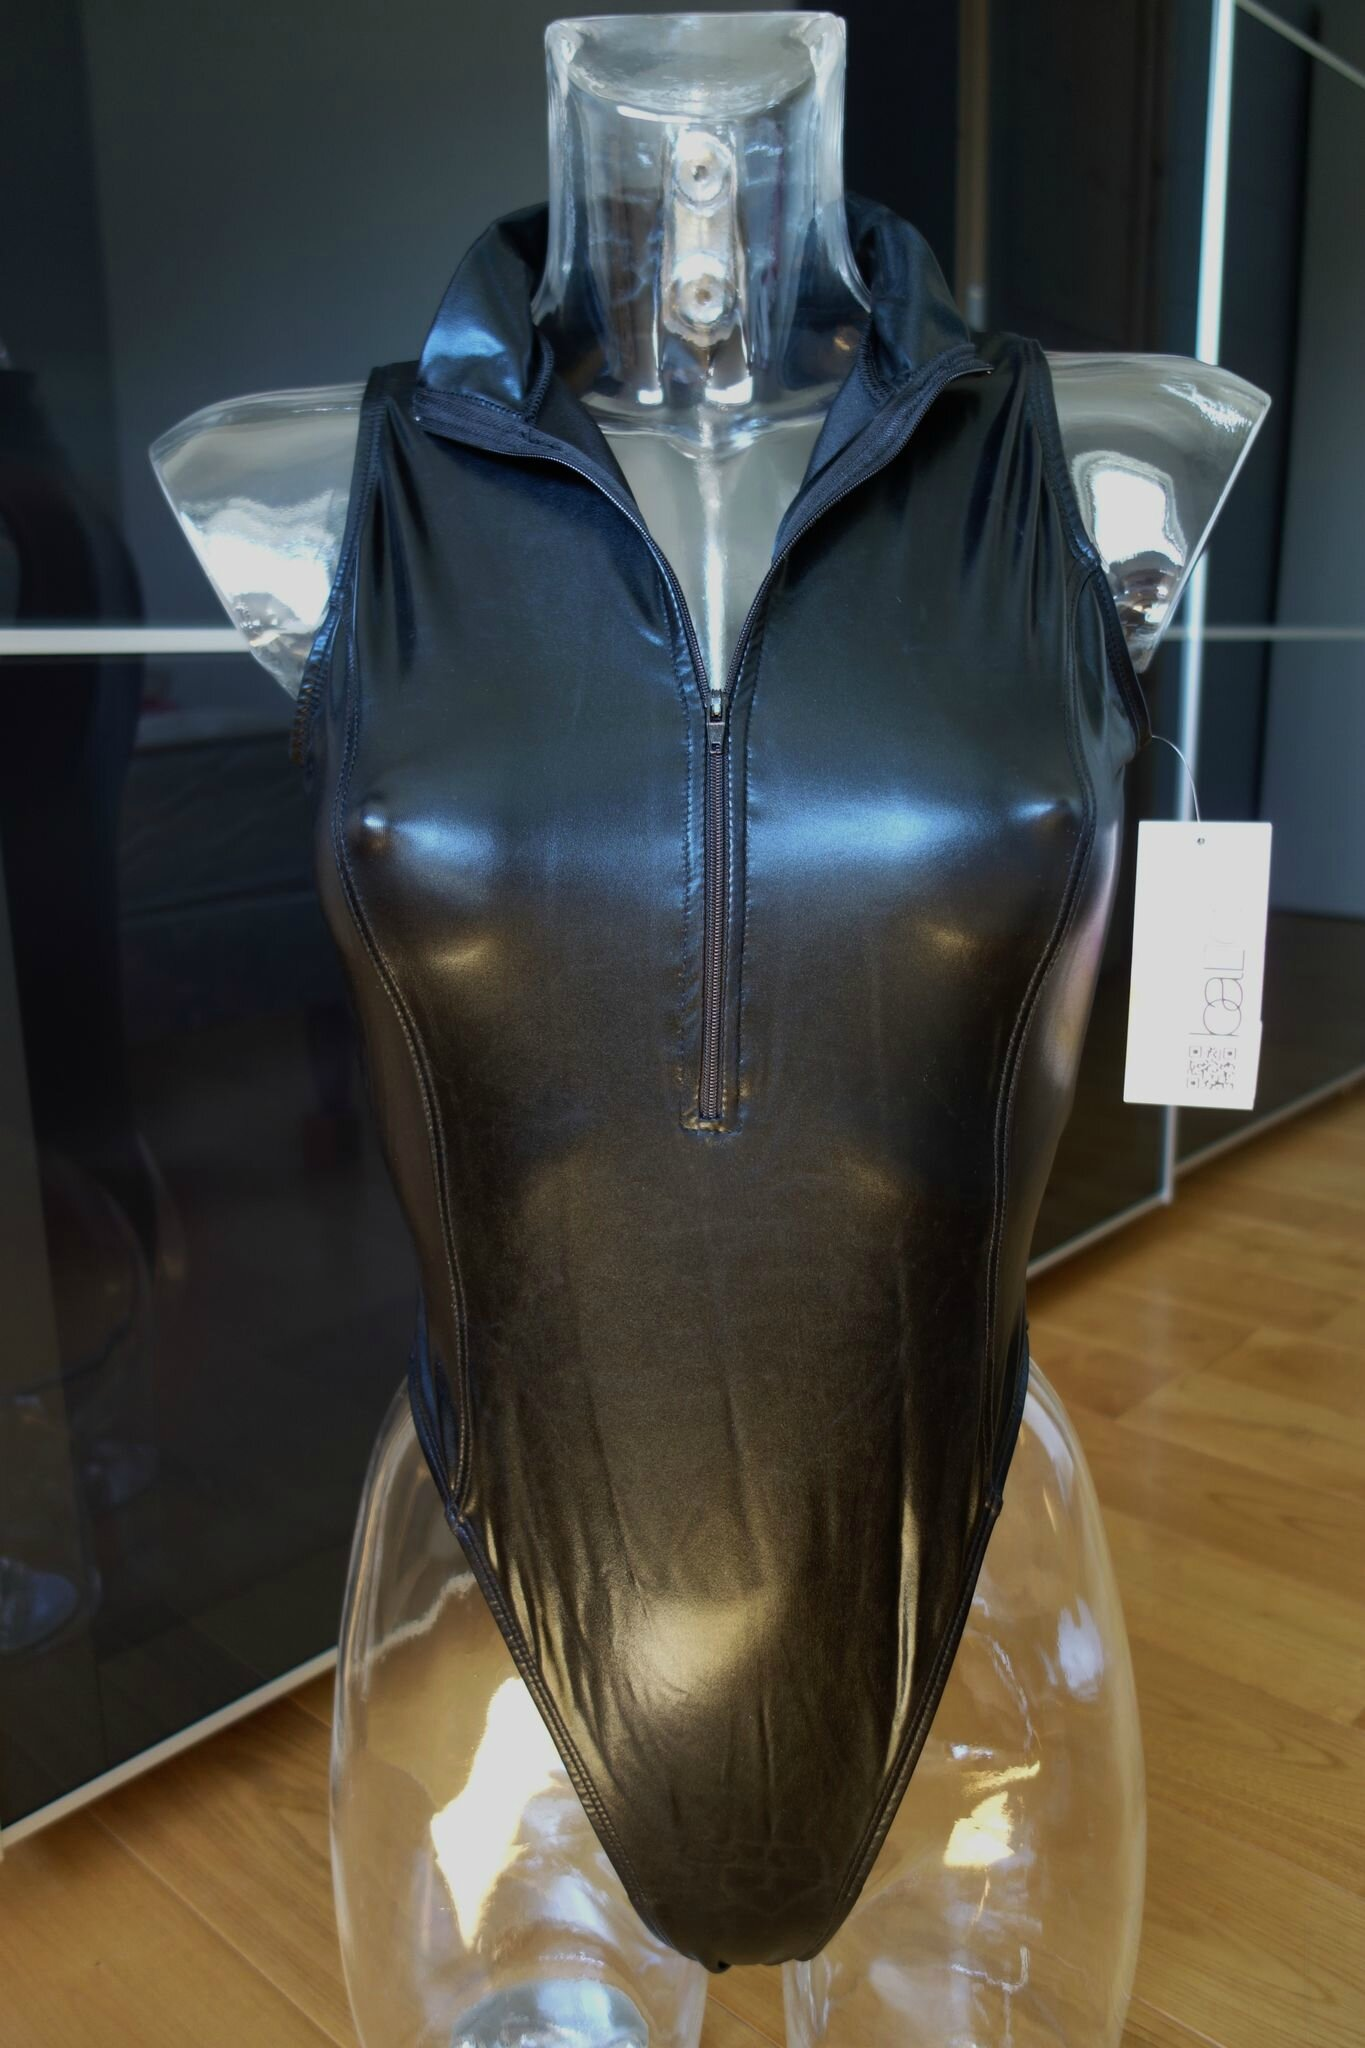 Les Bodys à effet cuir liquide